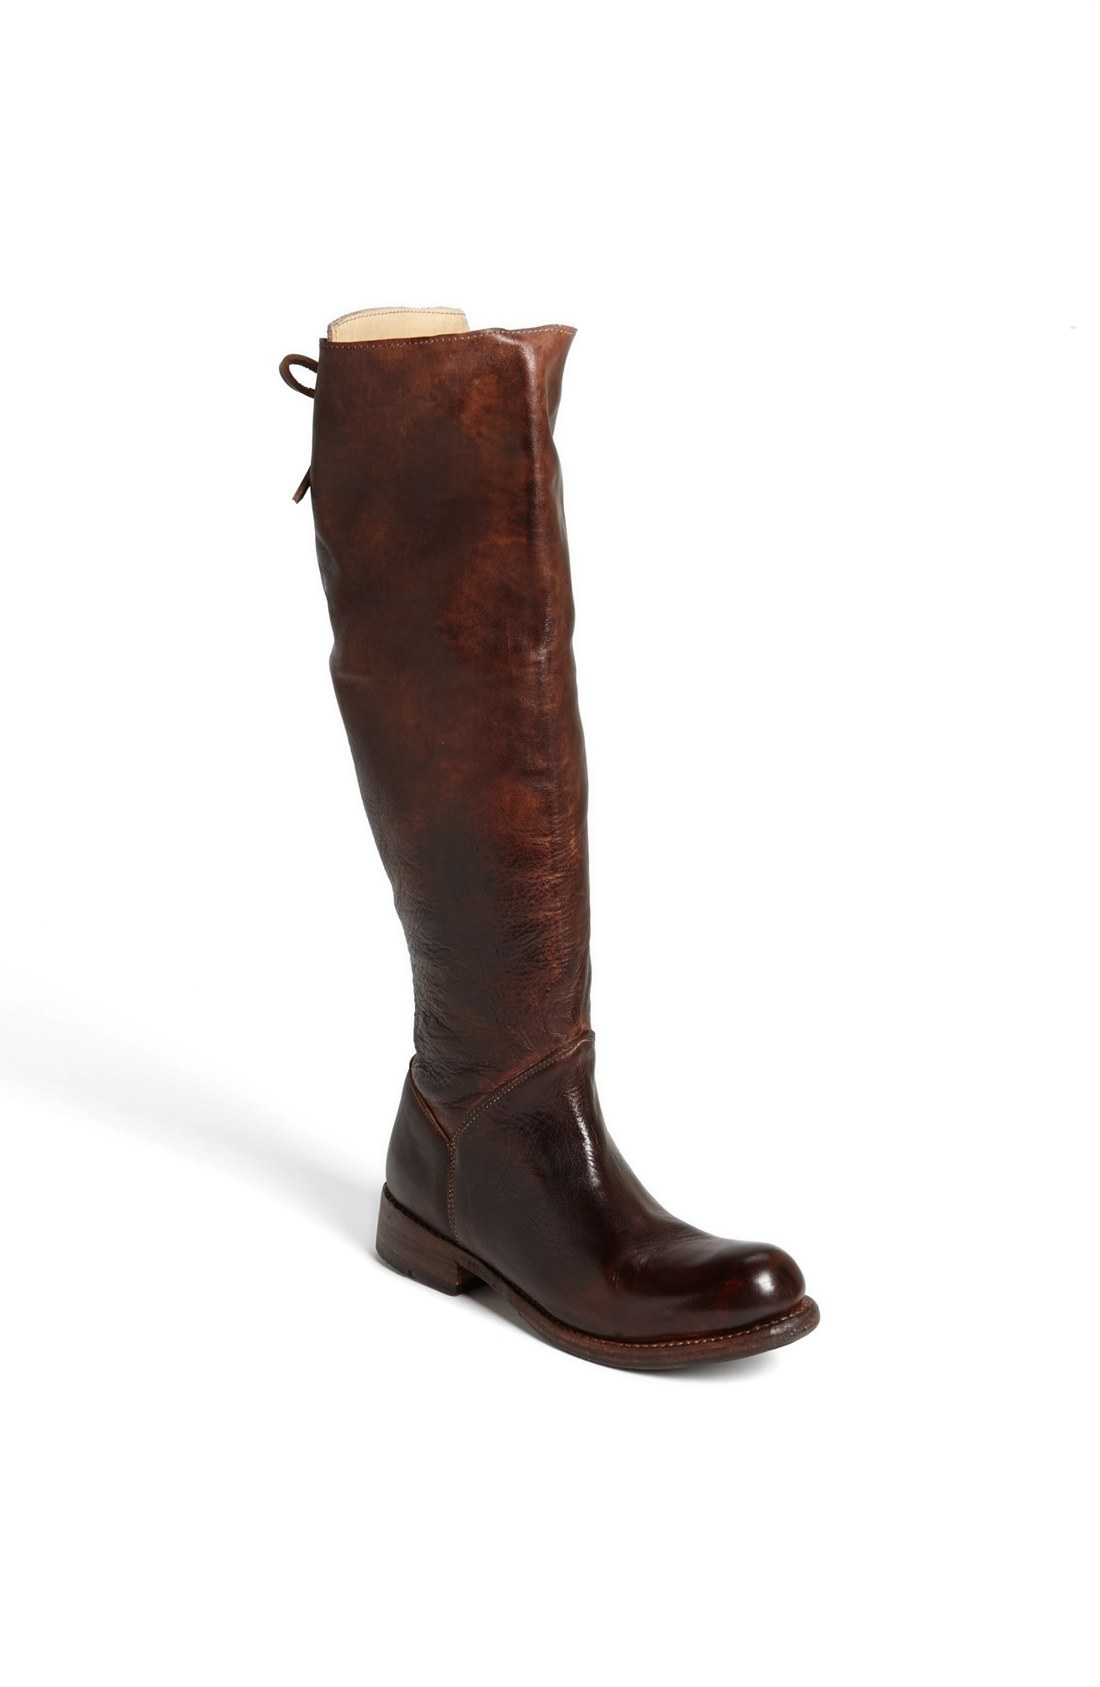 Bed Stu Revolution Black Greenland Boots